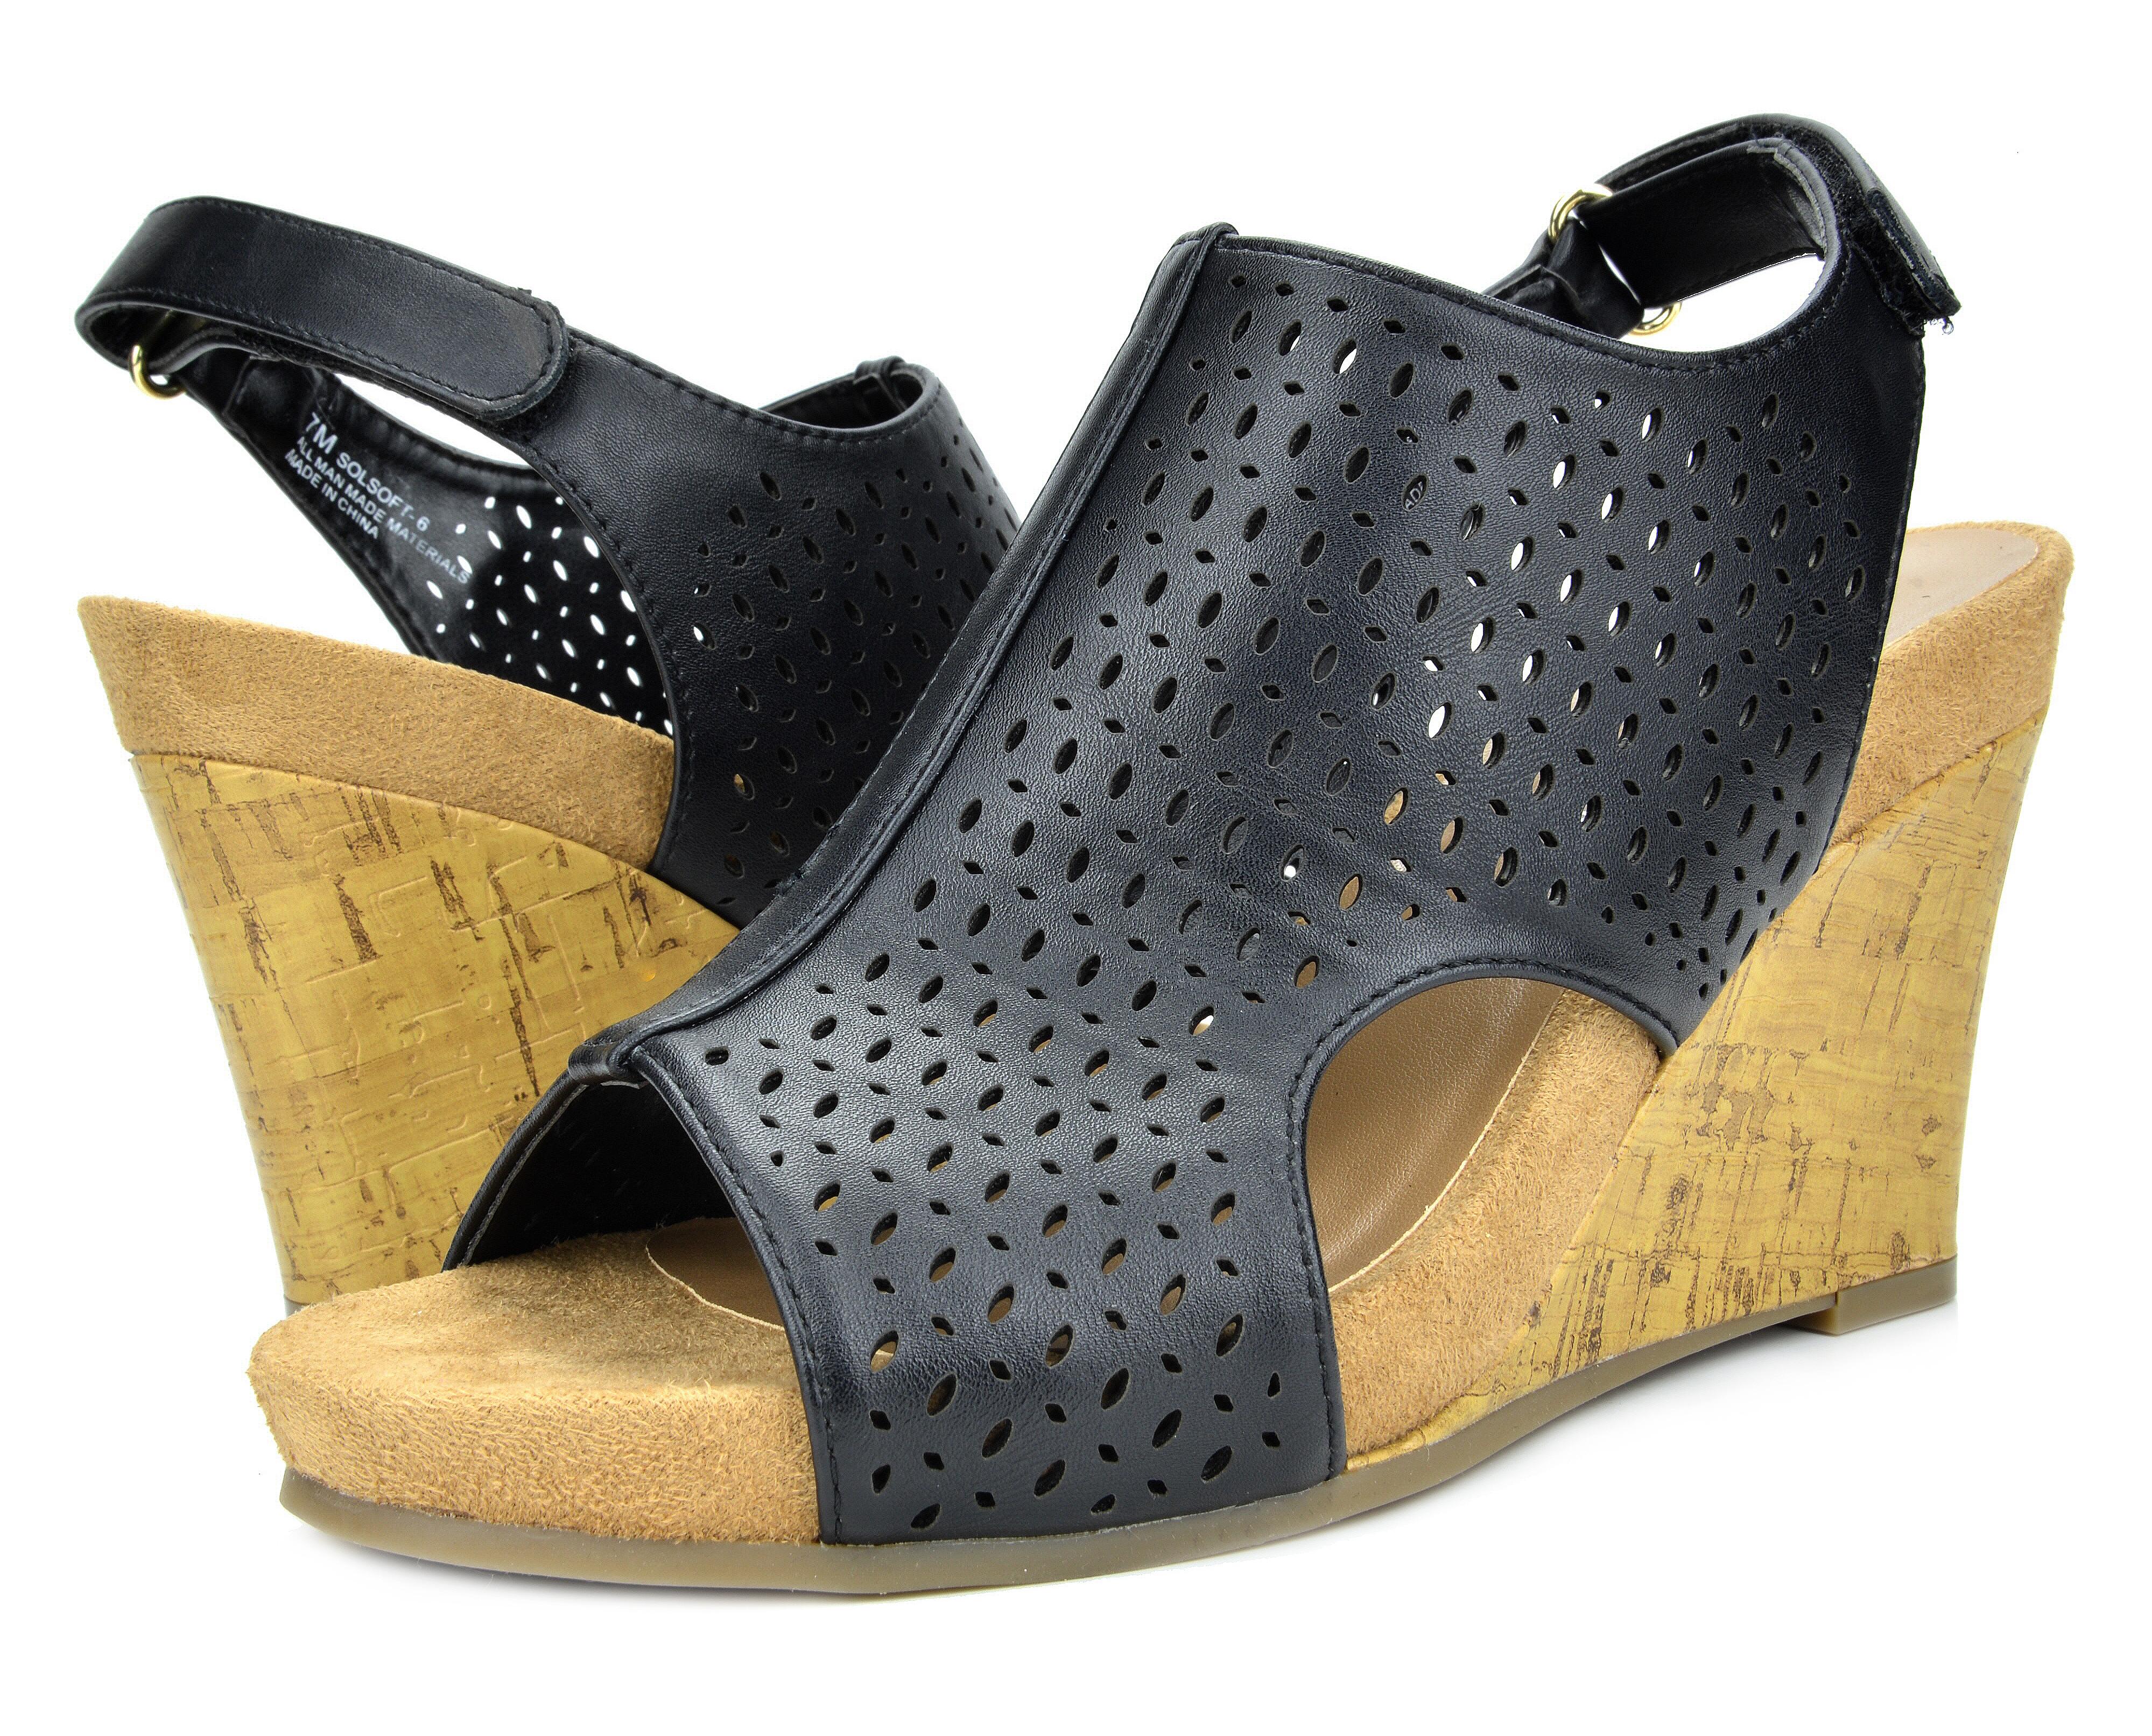 10103c0f61b7 TOETOS Women SOLSOFT-6 Open-toe Street Mid Heels Platform Wedges ...